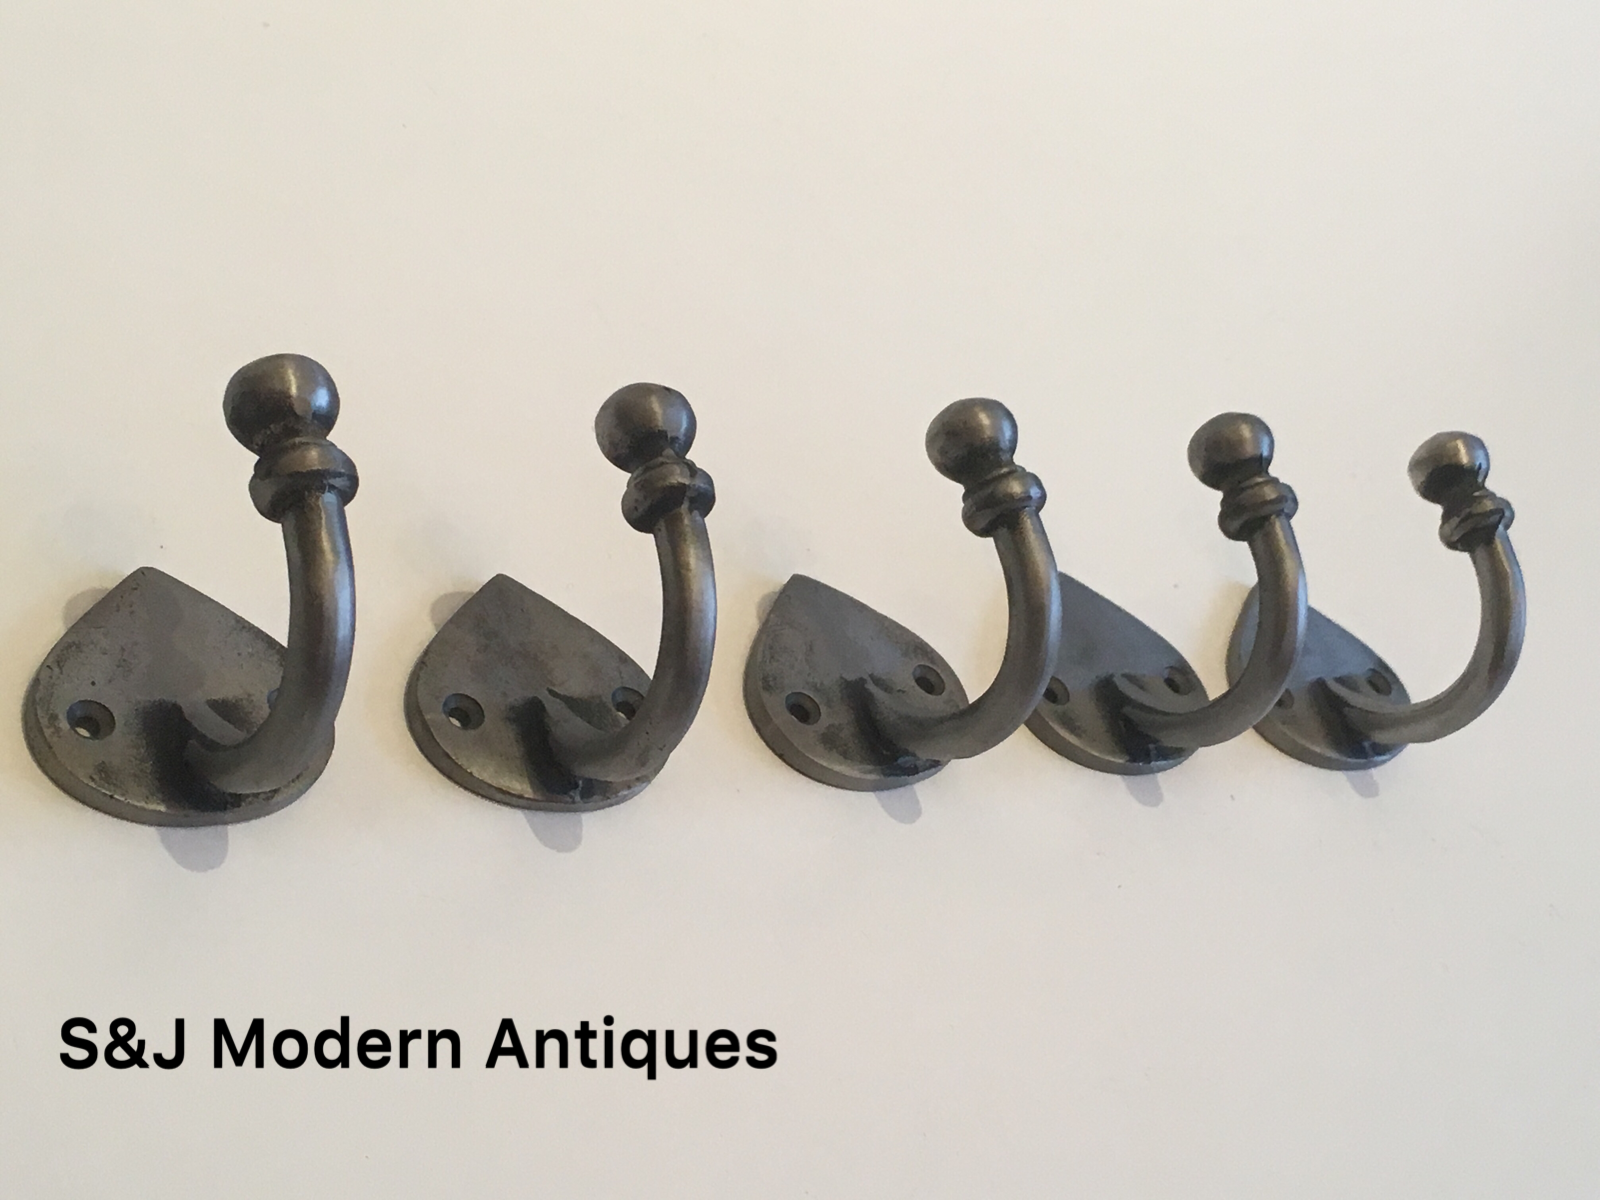 Single Coat Hook Iron Antique Modern Spearhead Vintage Black Grey Hat Rack Set 5 10